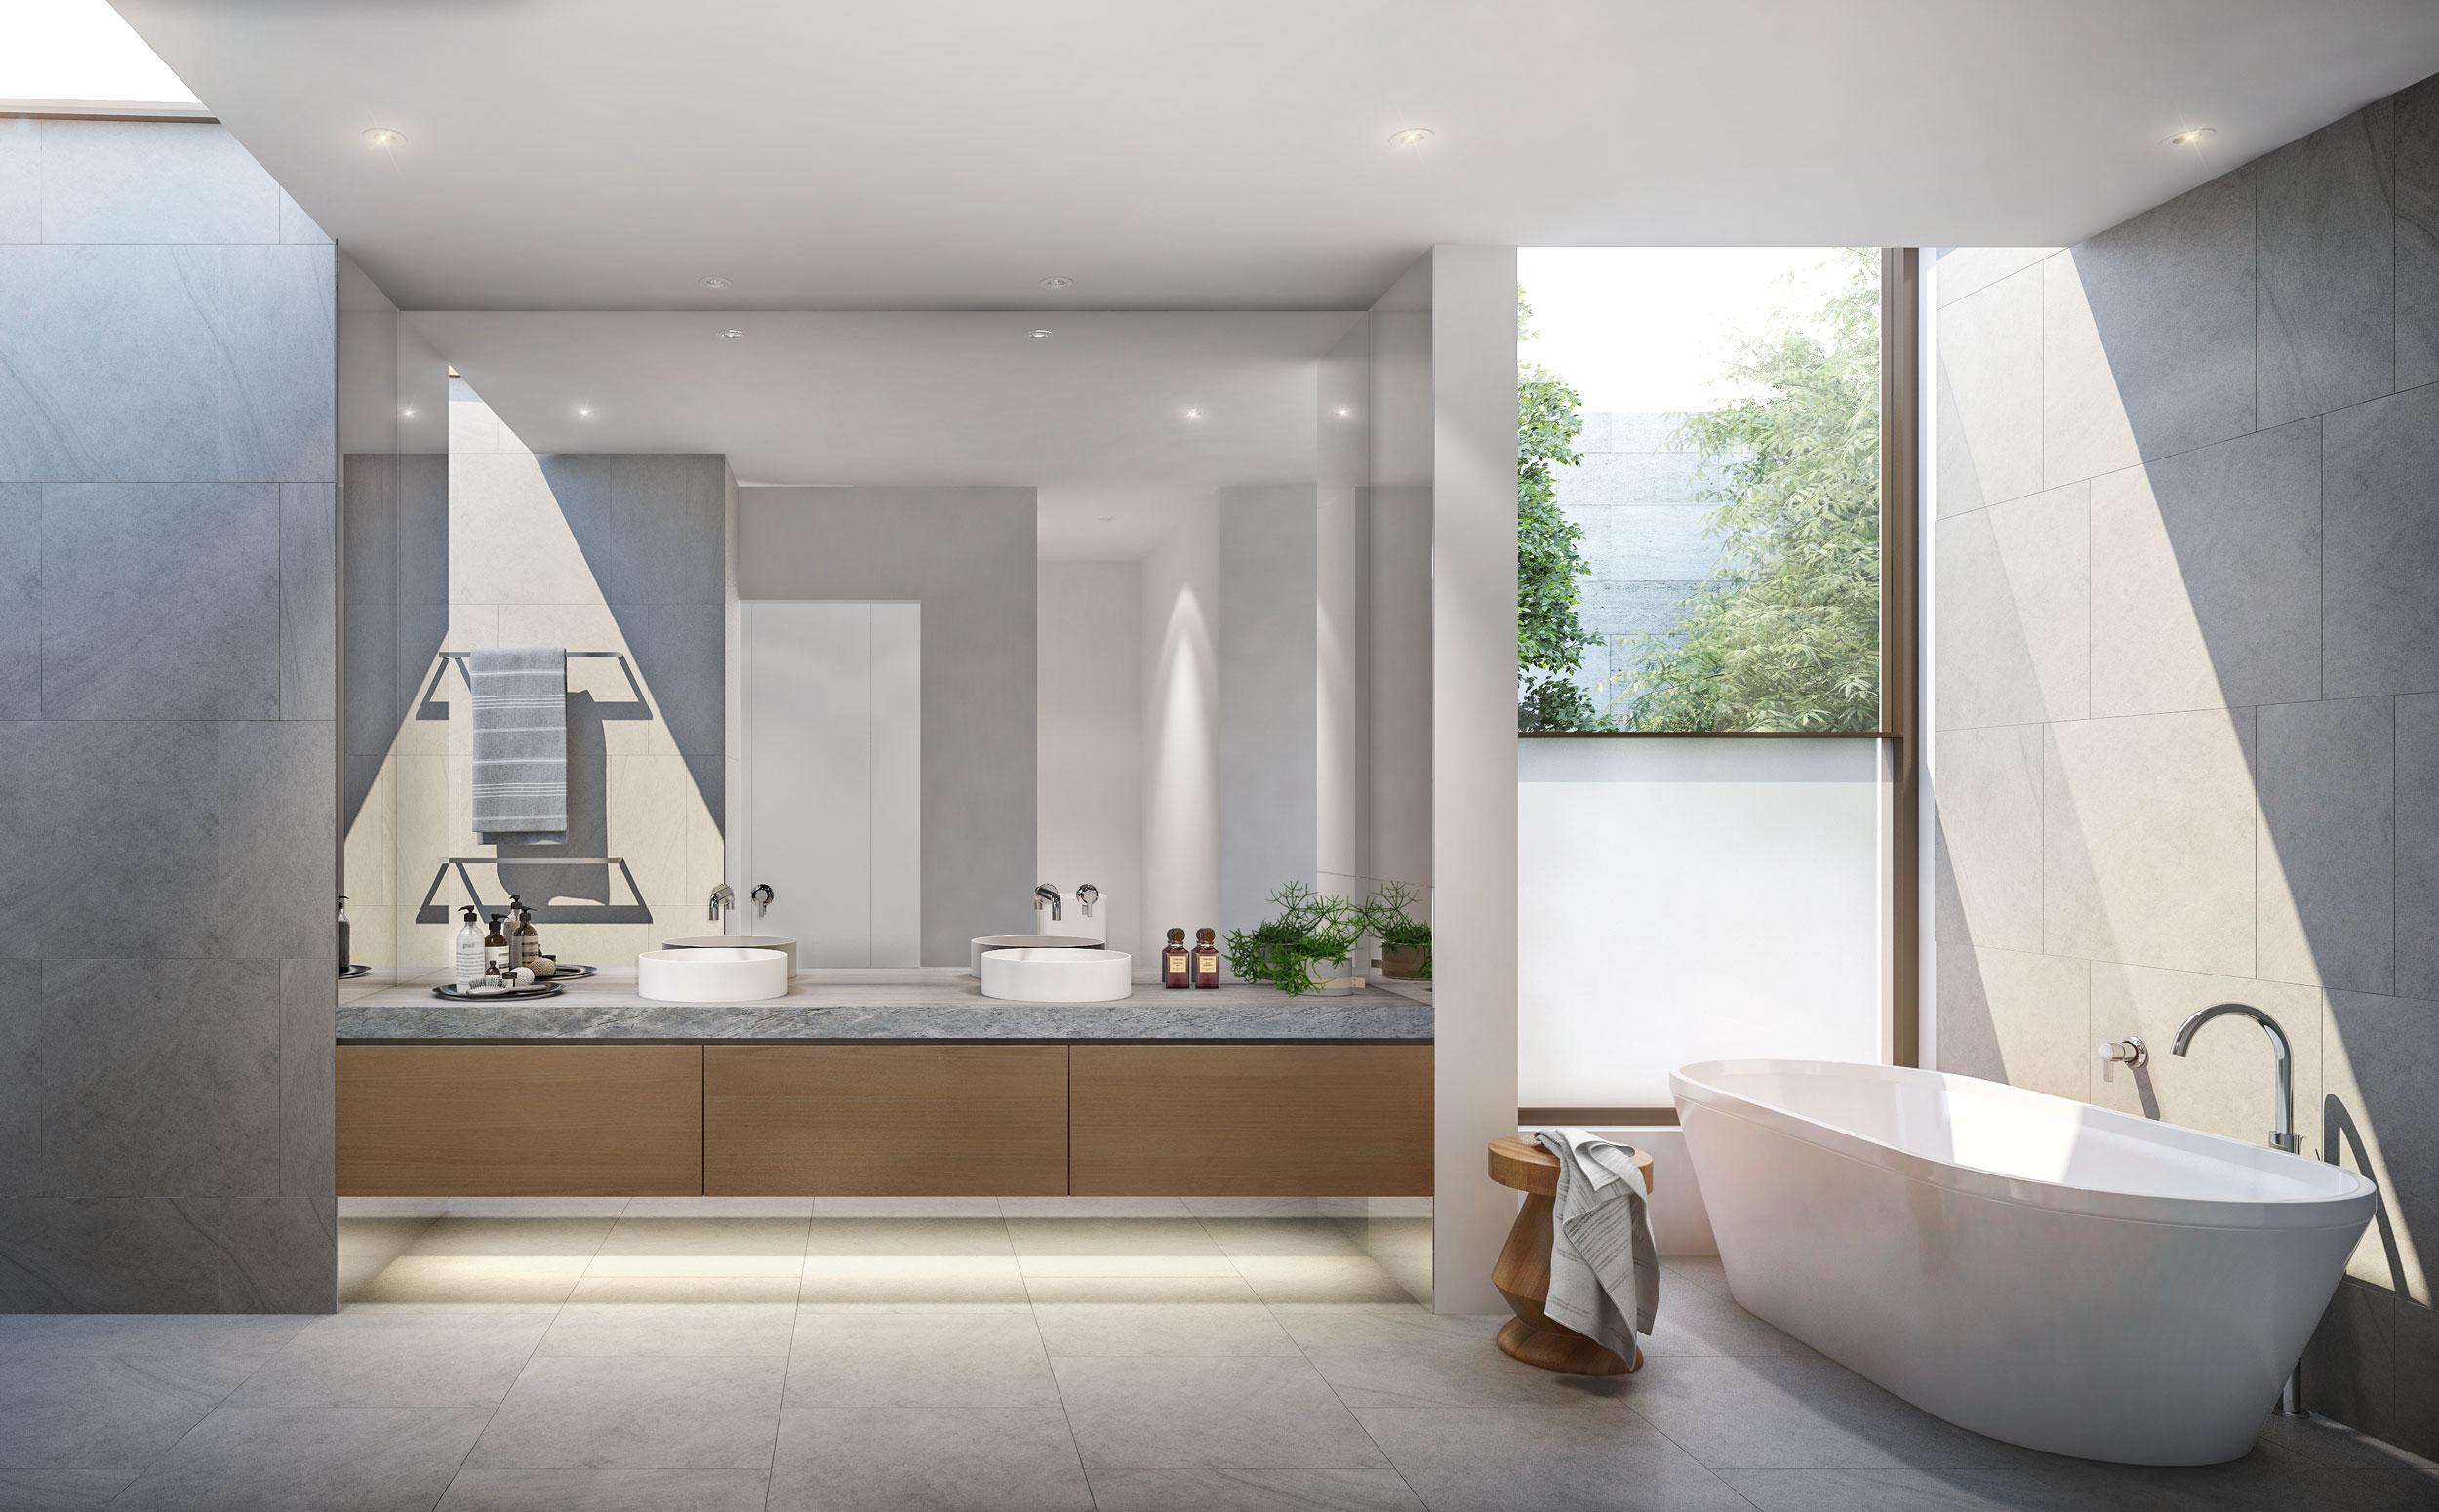 Bathroom Tiles Rockingham rockingham street